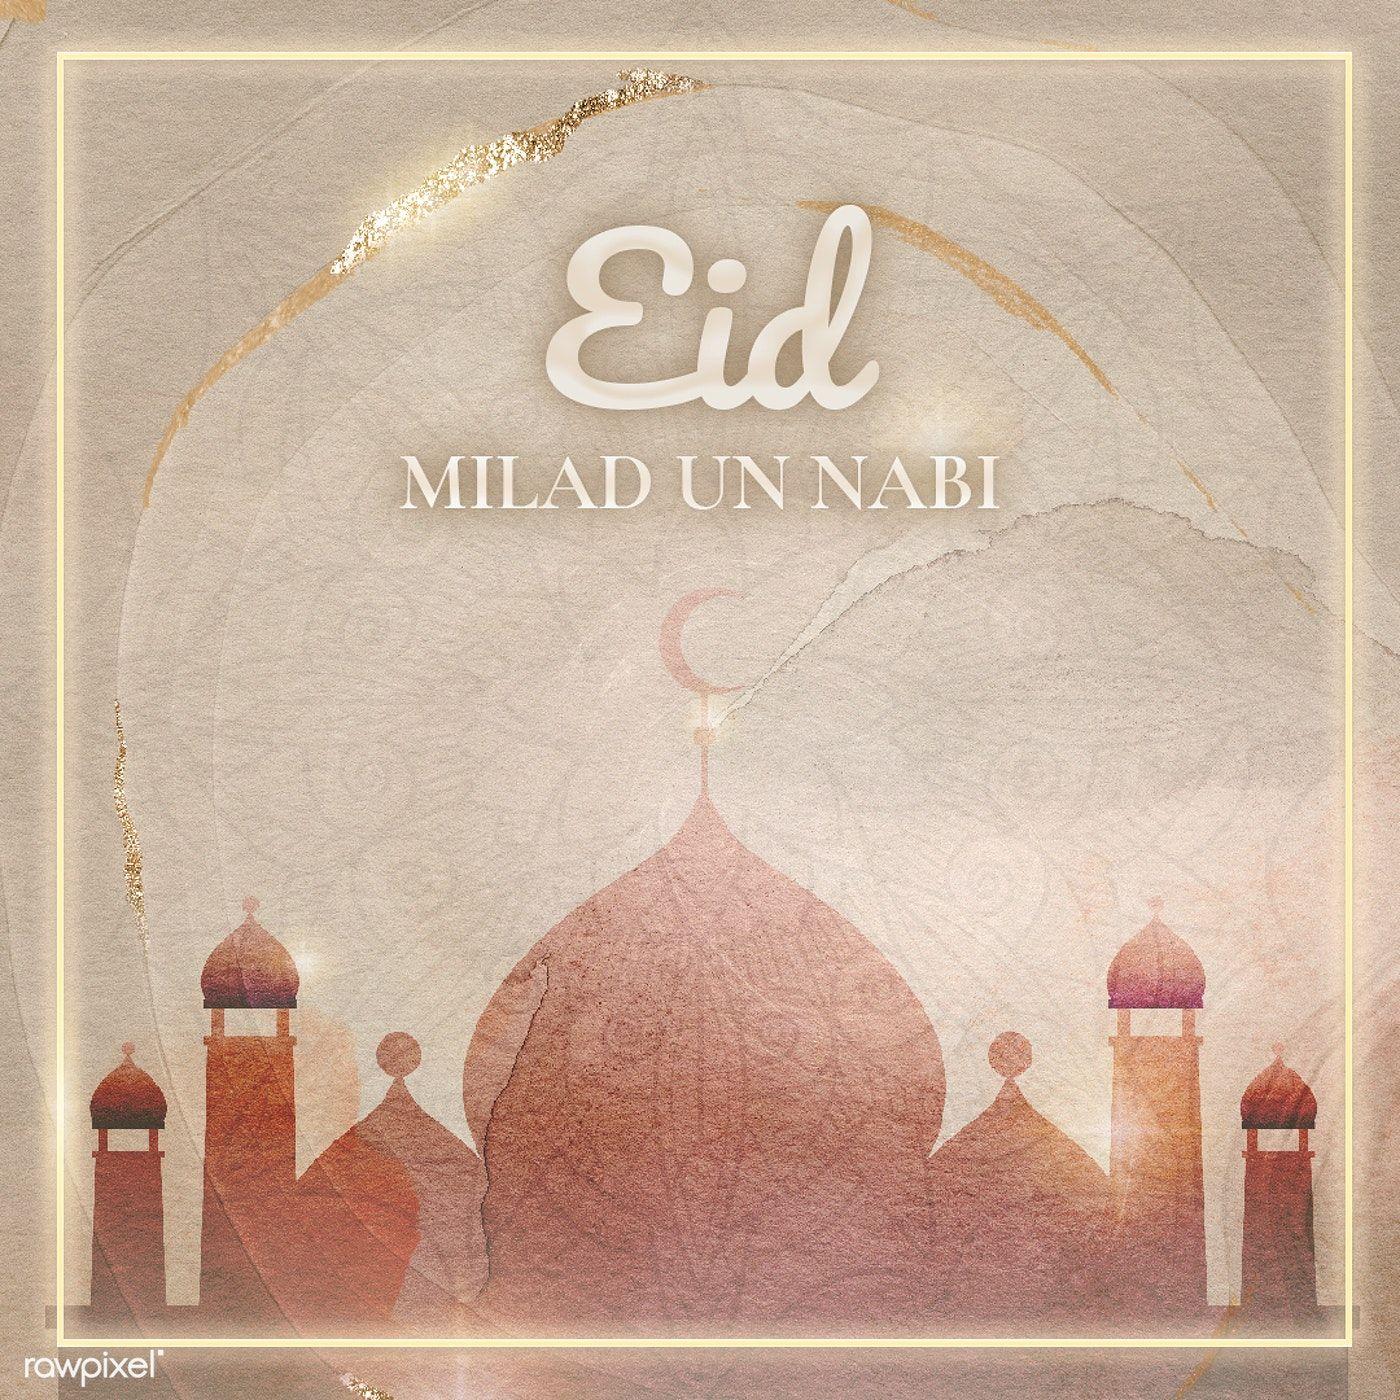 Download Premium Illustration Of Festive Eid Mubarak Greeting Card Eid Mubarak Greetings Eid Mubarak Greeting Cards Eid Mubarak